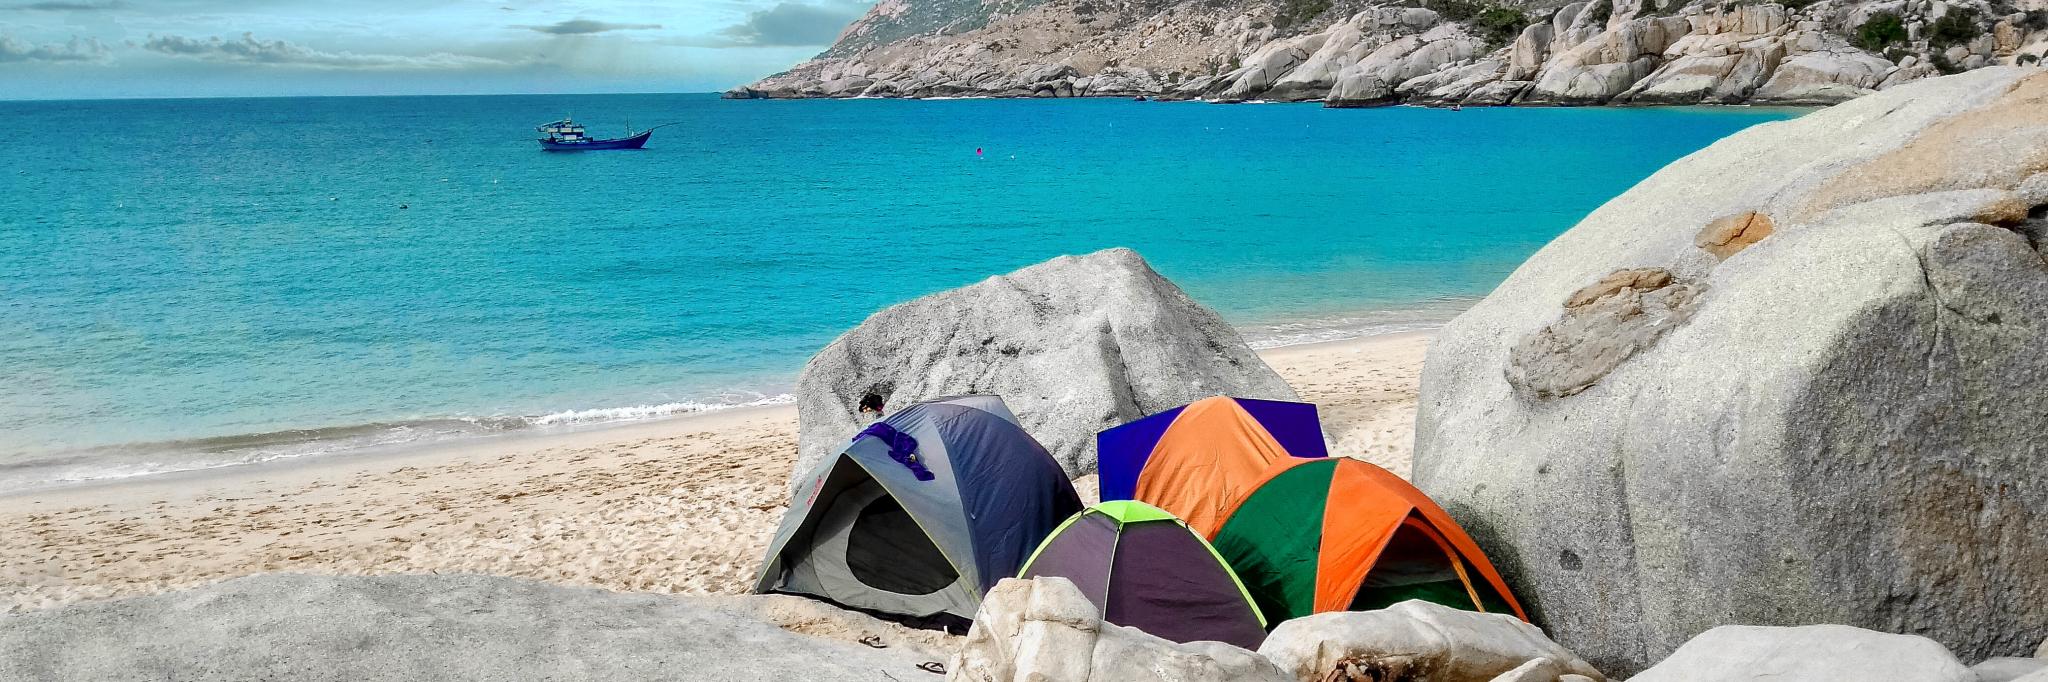 https://gody.vn/blog/thjentu954524/post/mui-dinh-thien-duong-cho-dan-camping-7091